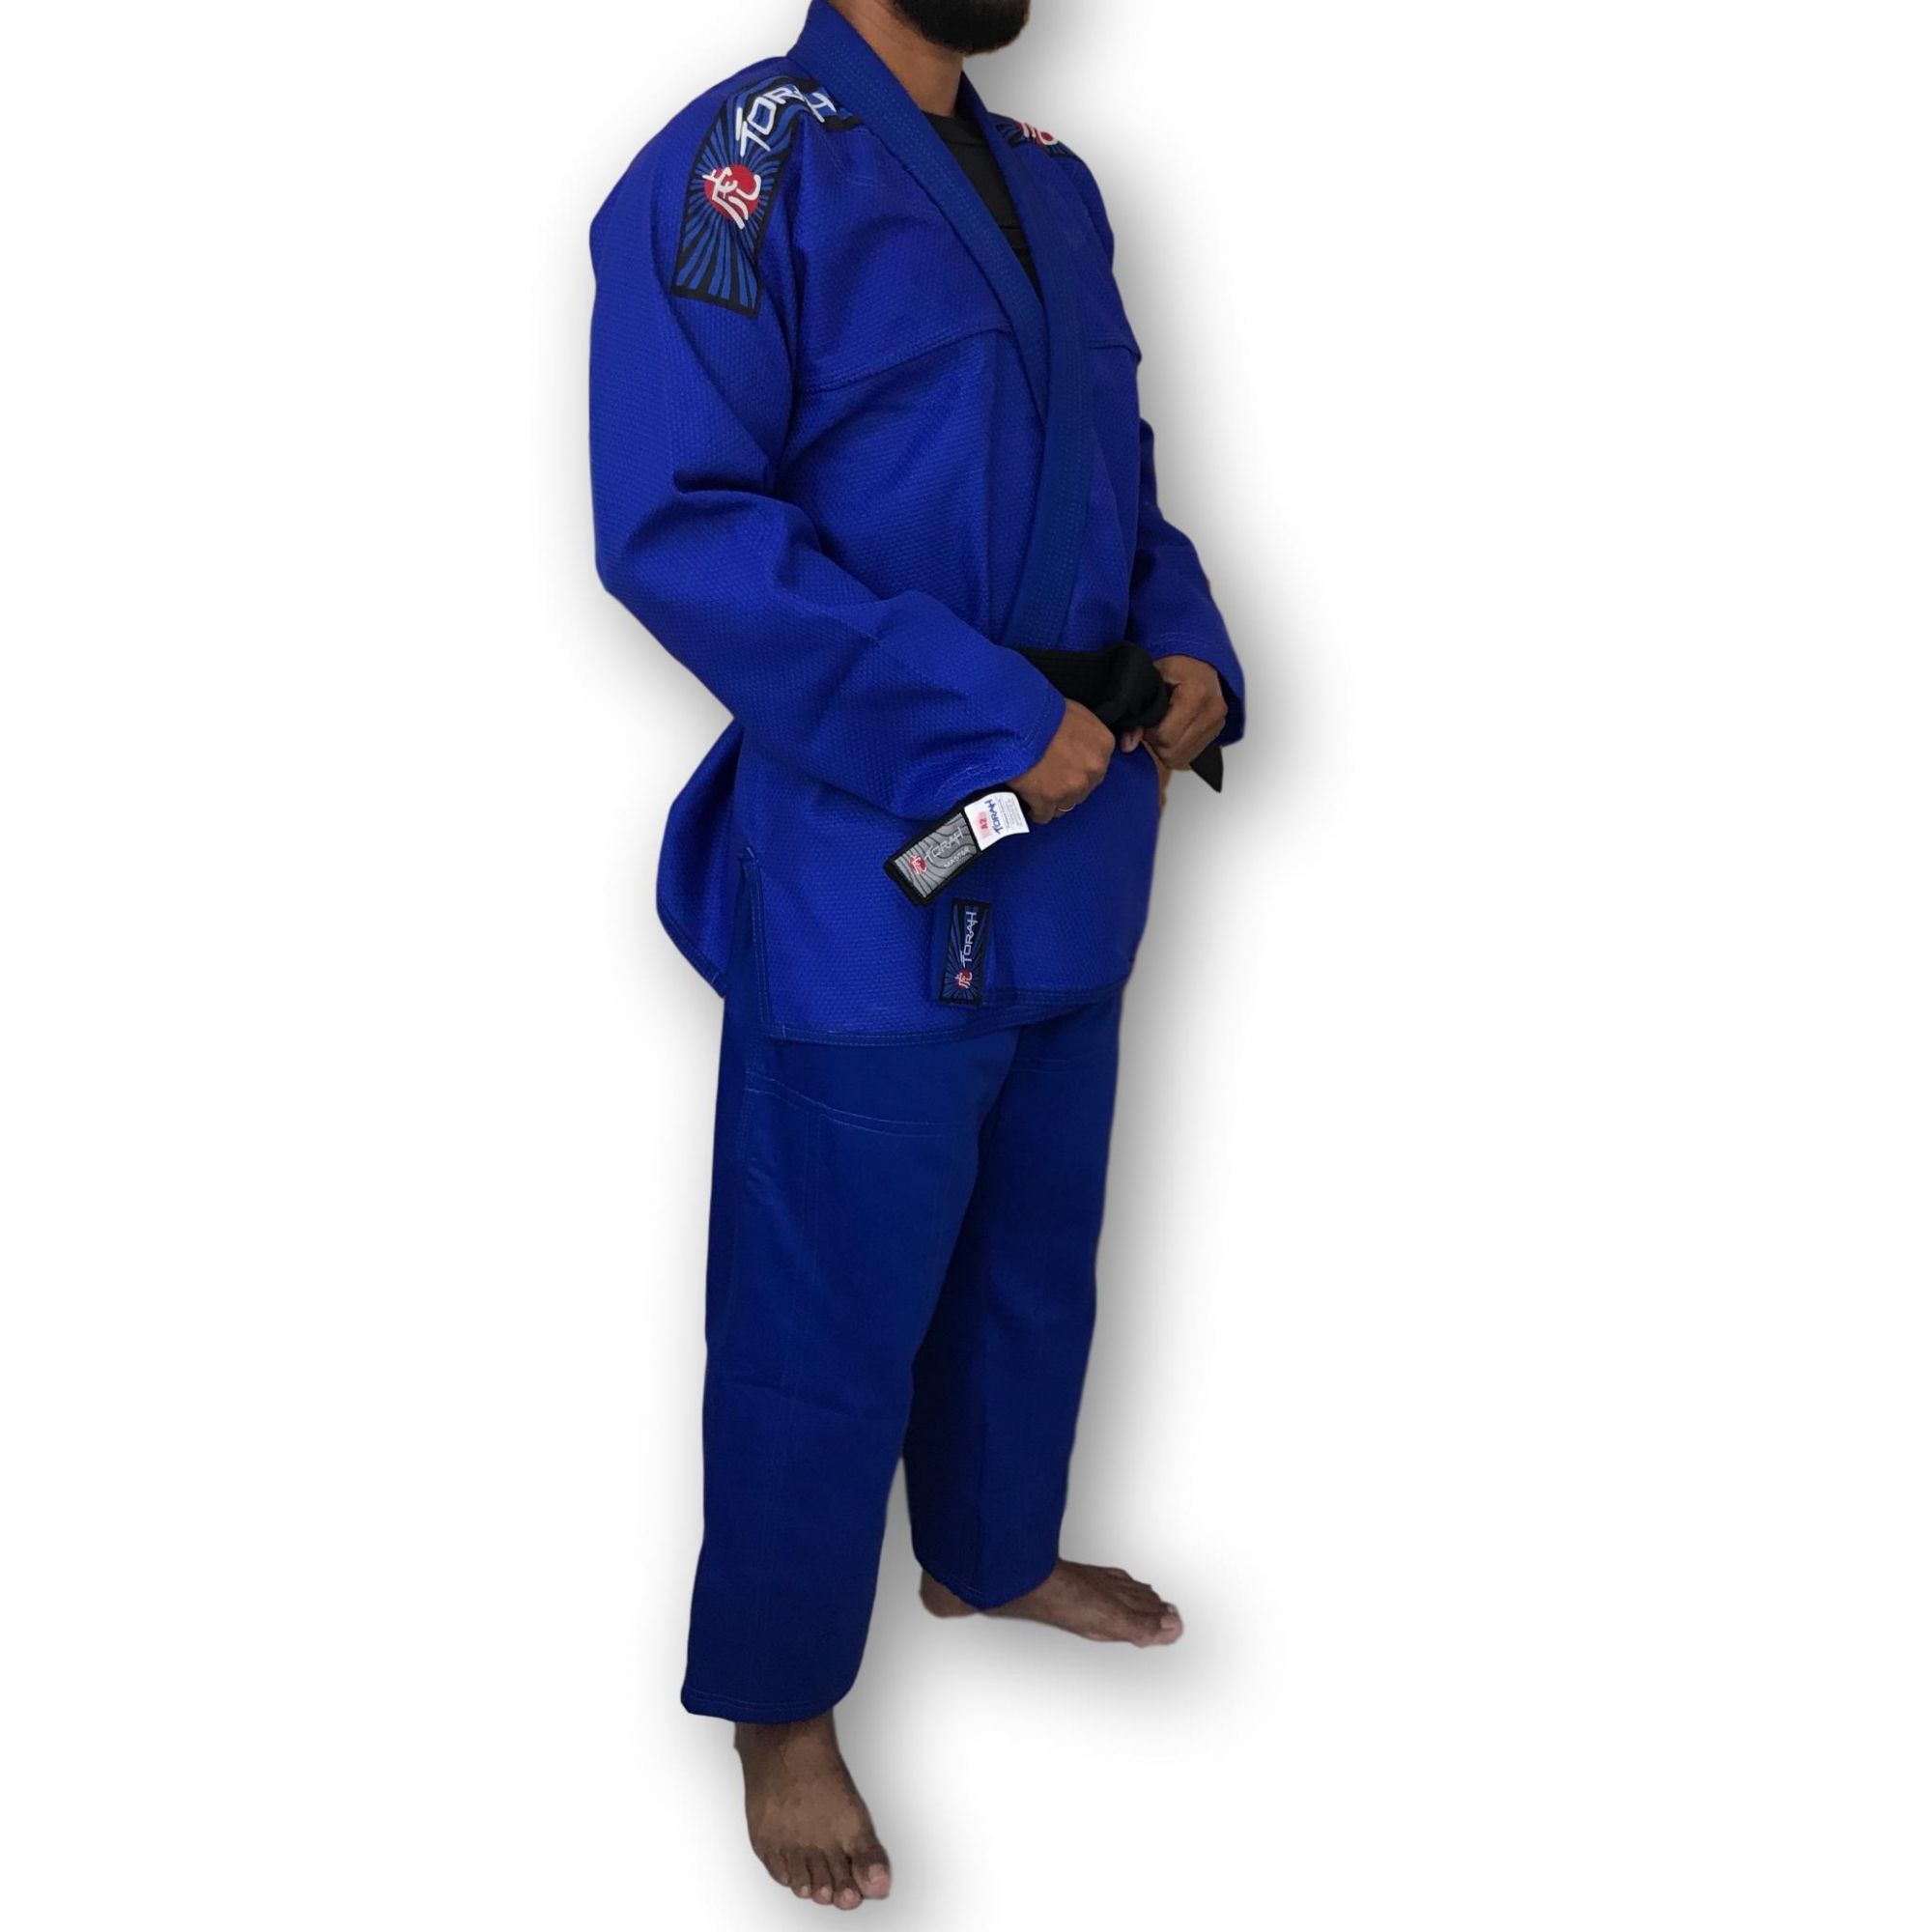 Kimono Trançado Flex Jiu Jitsu Adulto - Azul - Torah